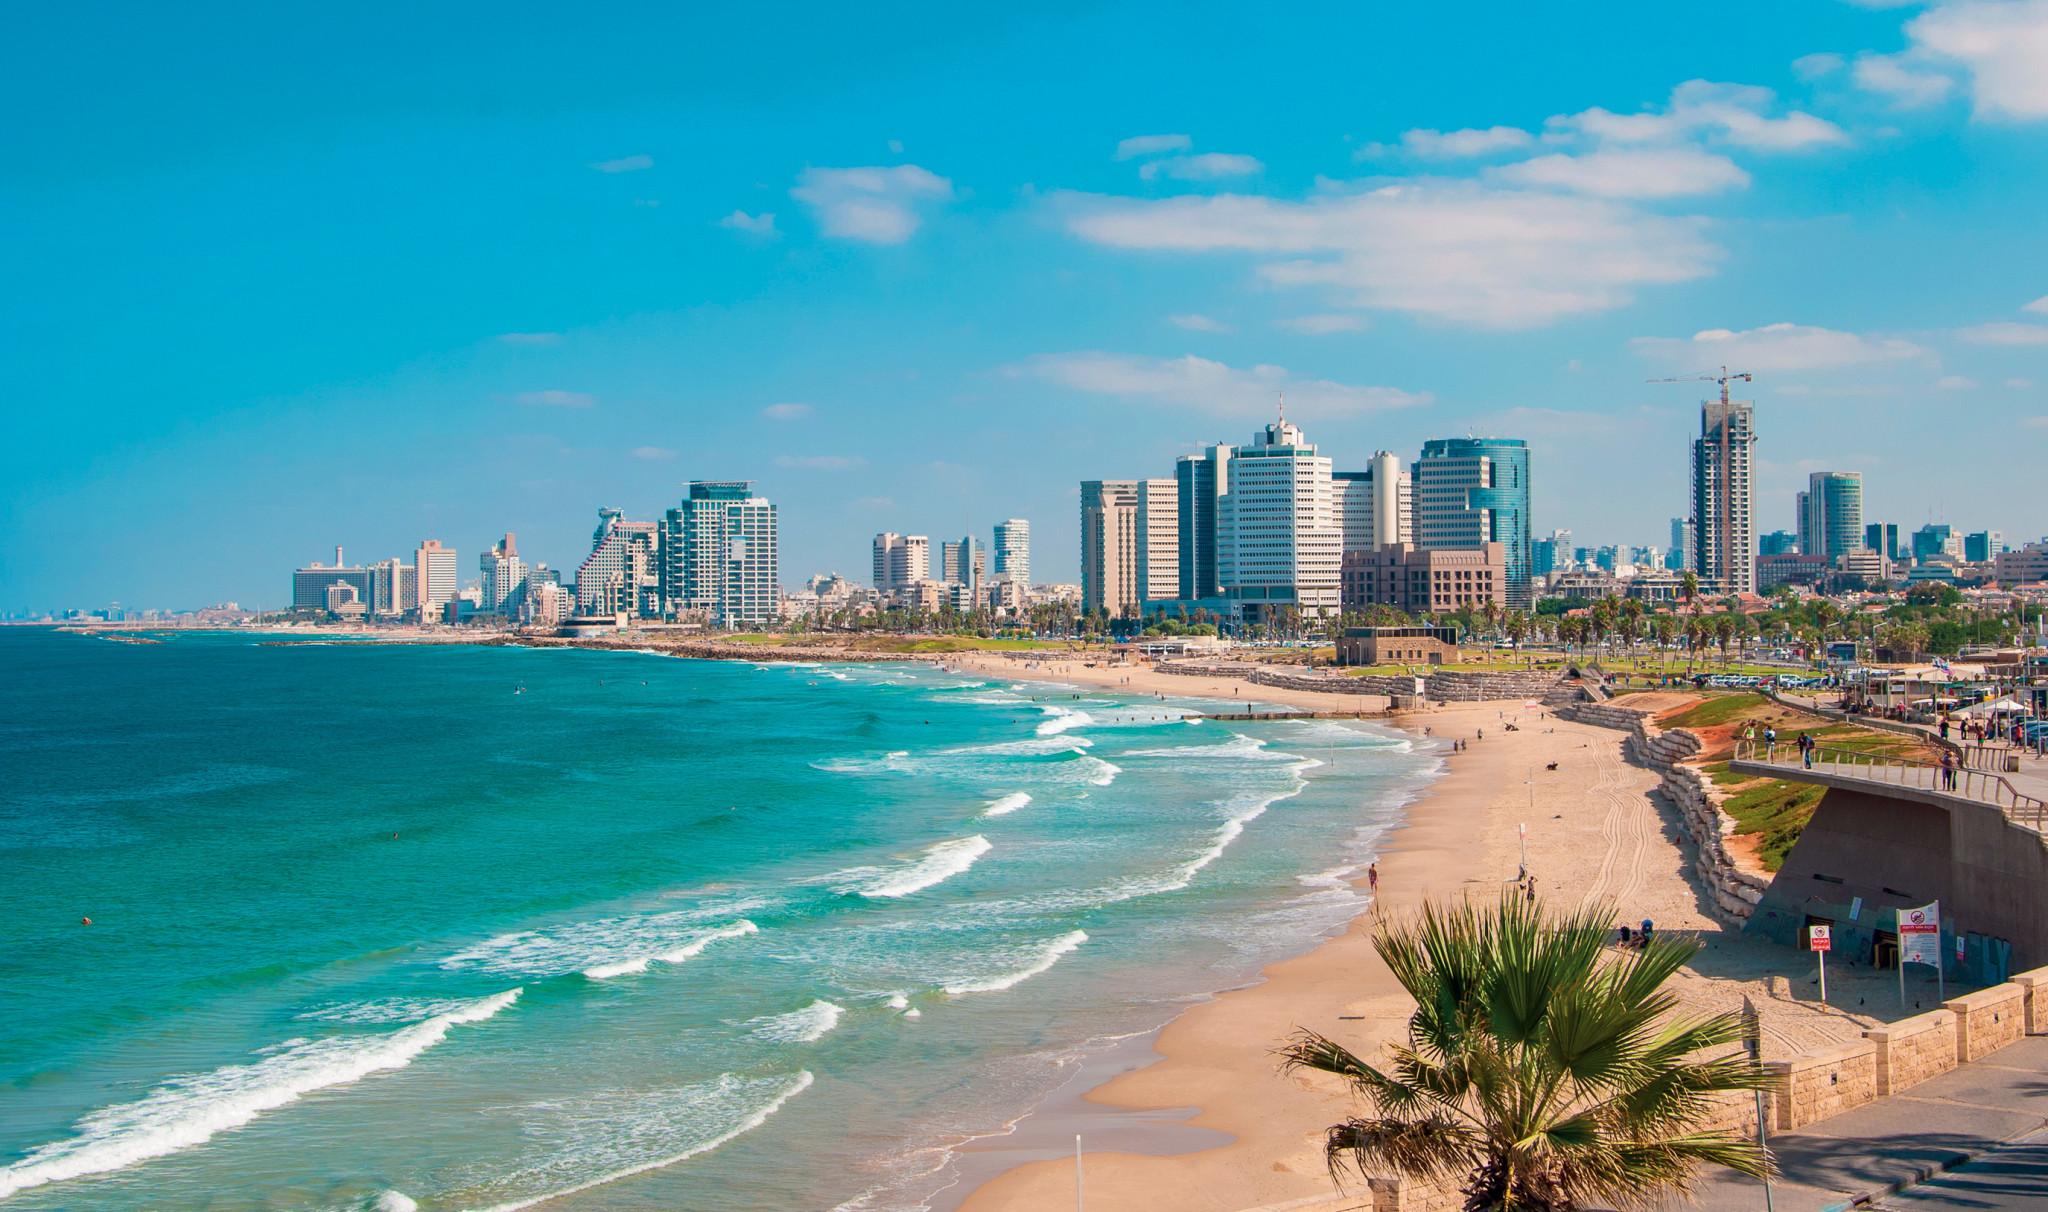 Израиль: кухня страны четырех морей ...: lisa.ru/izrail-kukhnya-strany-chetyrekh-morey